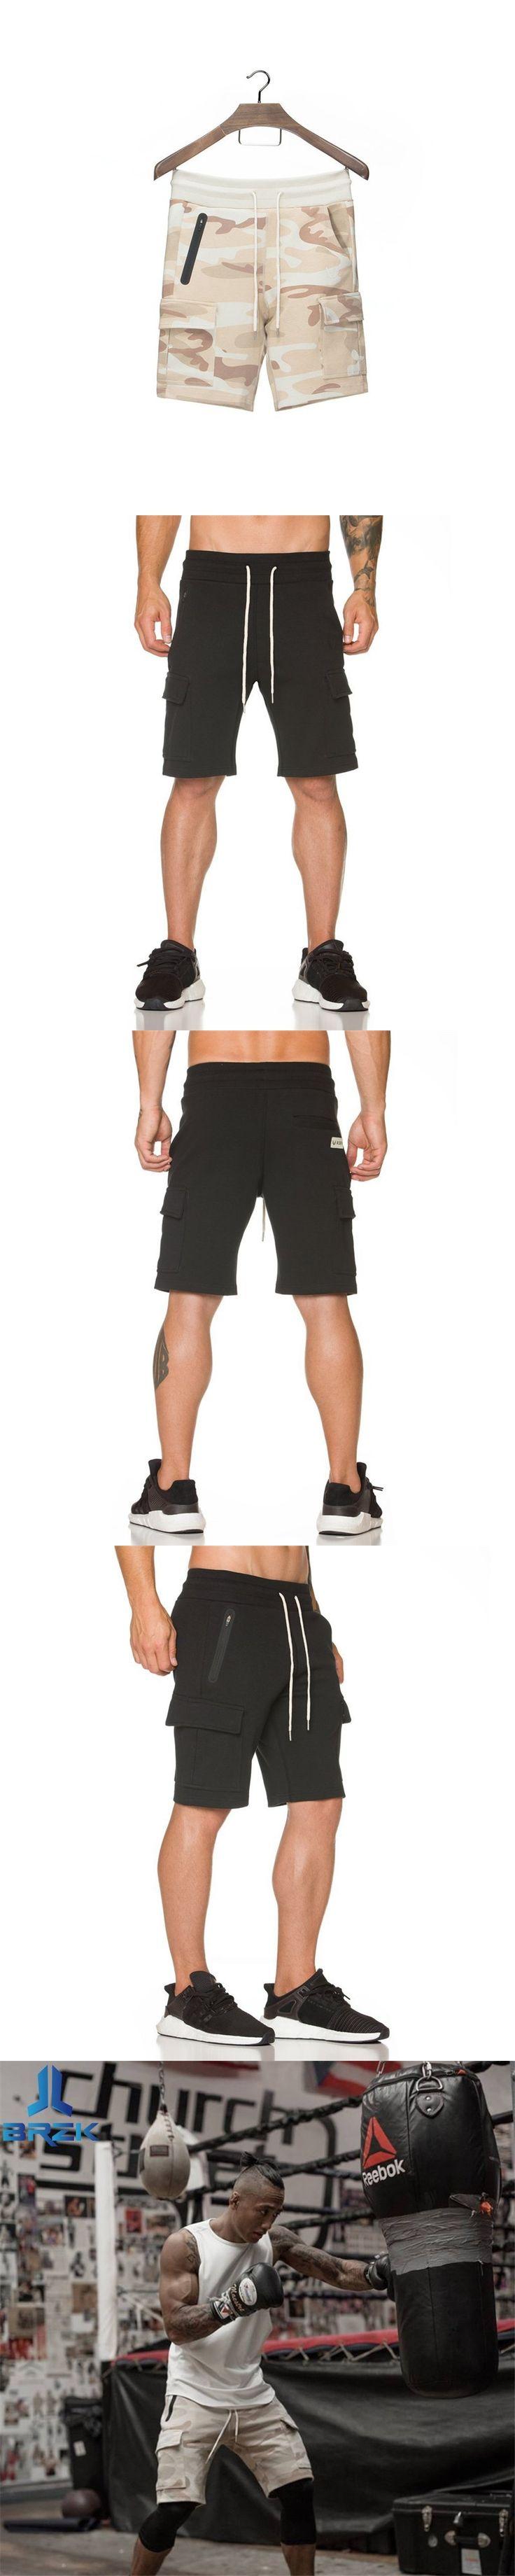 BRZK New Fashion Men Sporting Shorts Trousers Cotton Bodybuilding Sweatpants Fitness Short Jogger Casual Gyms Men Shorts